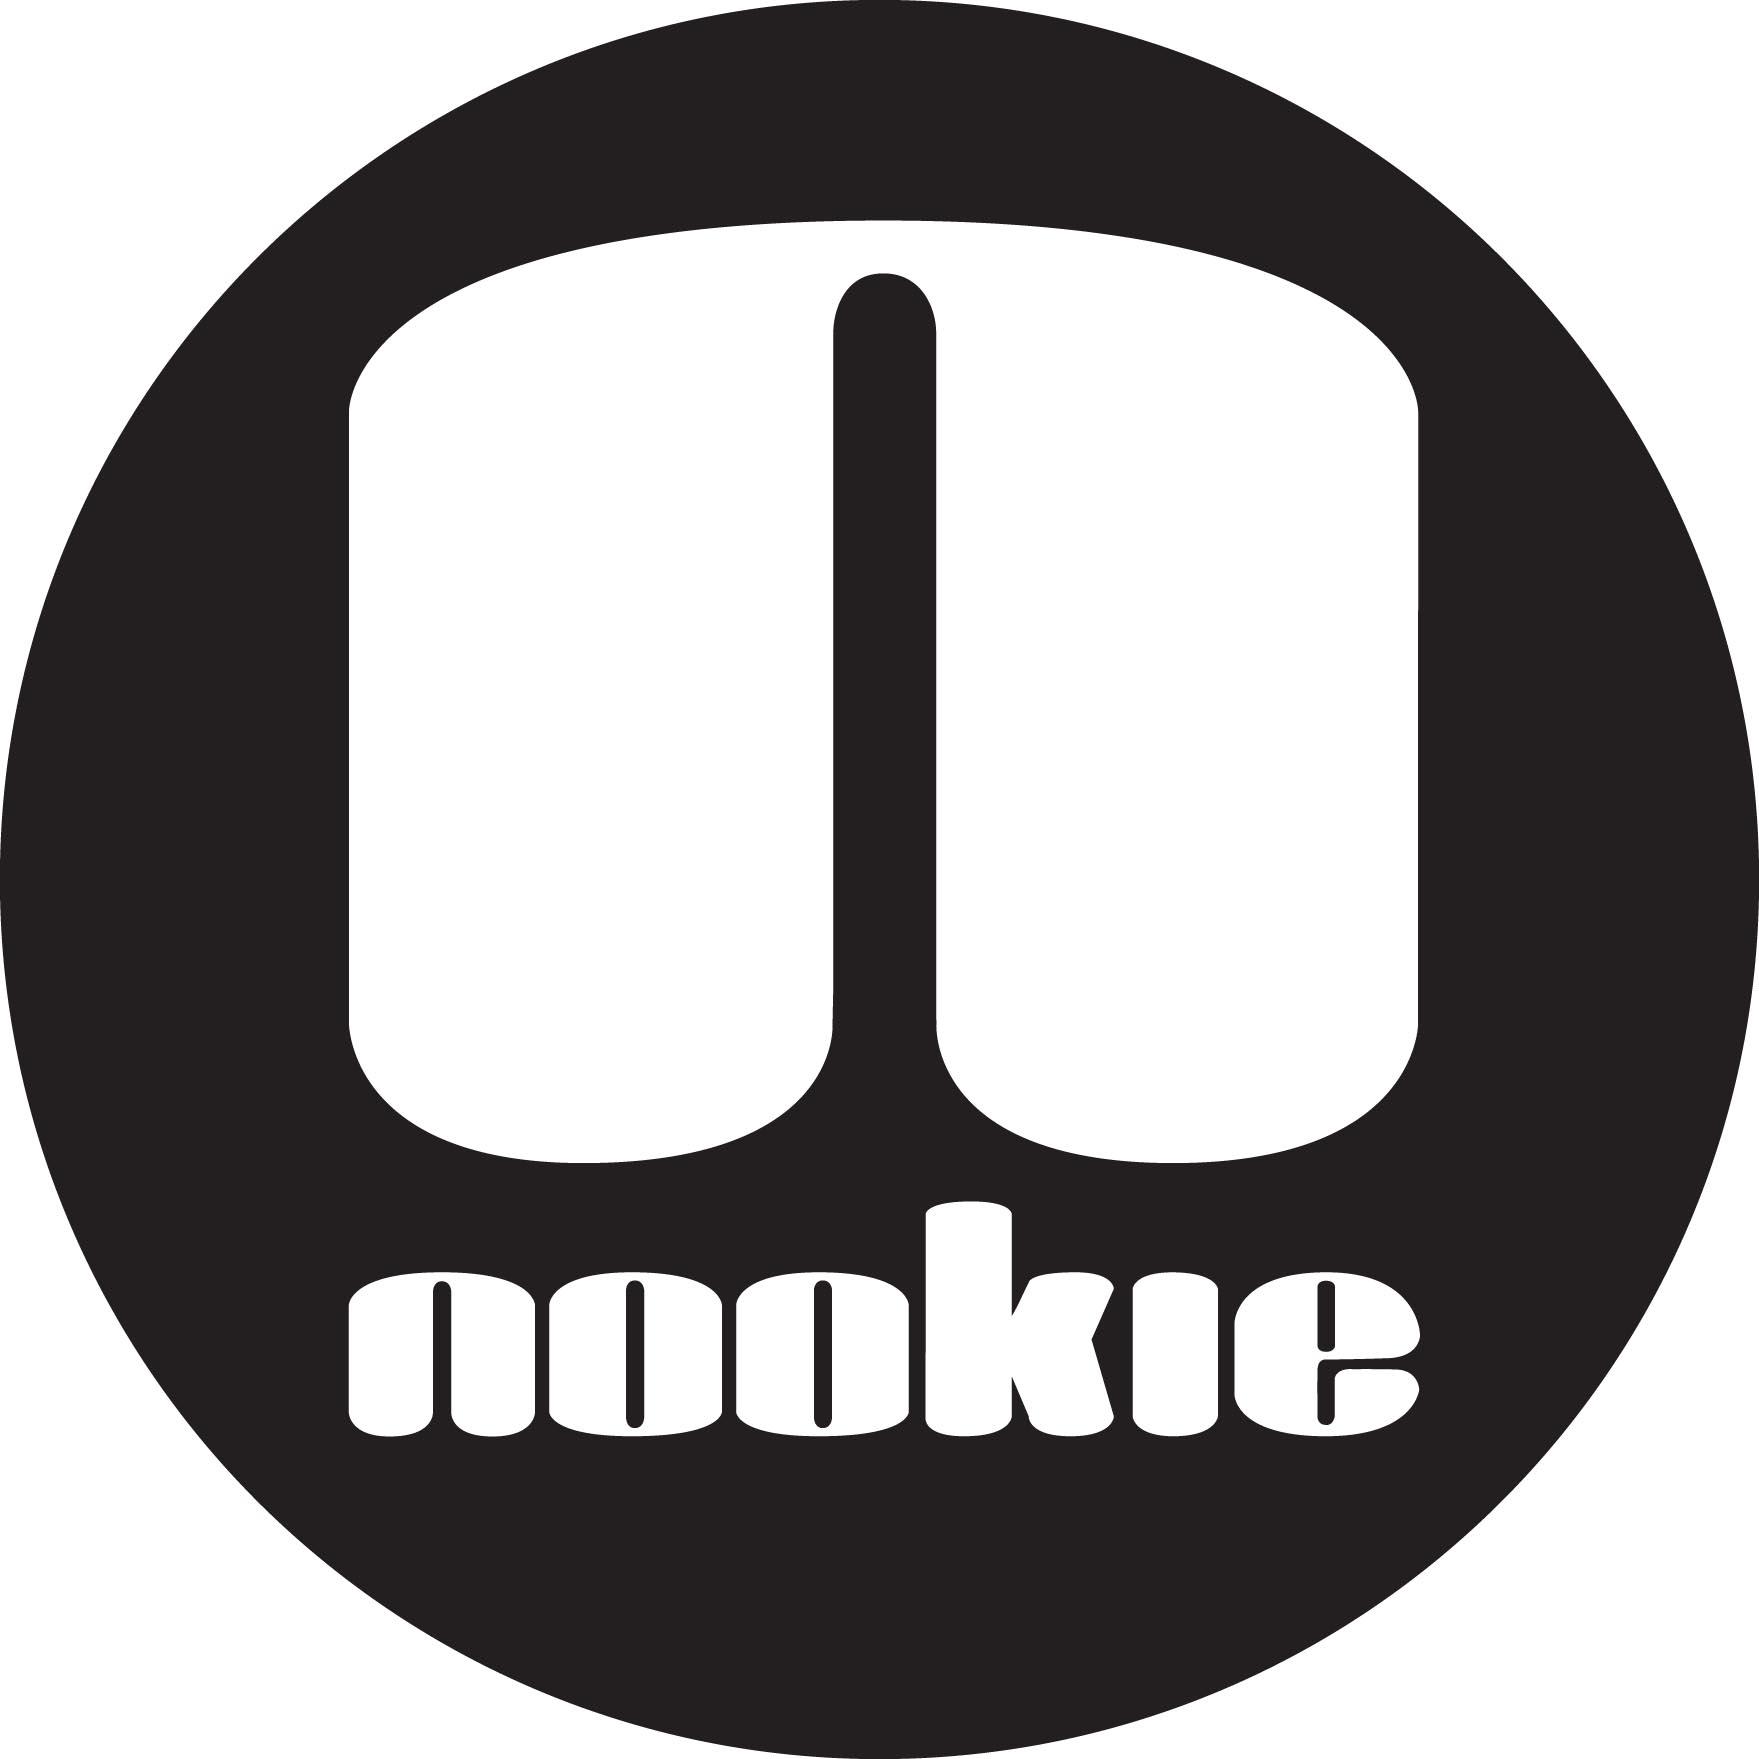 Nookie Logo Sticker Black Circle